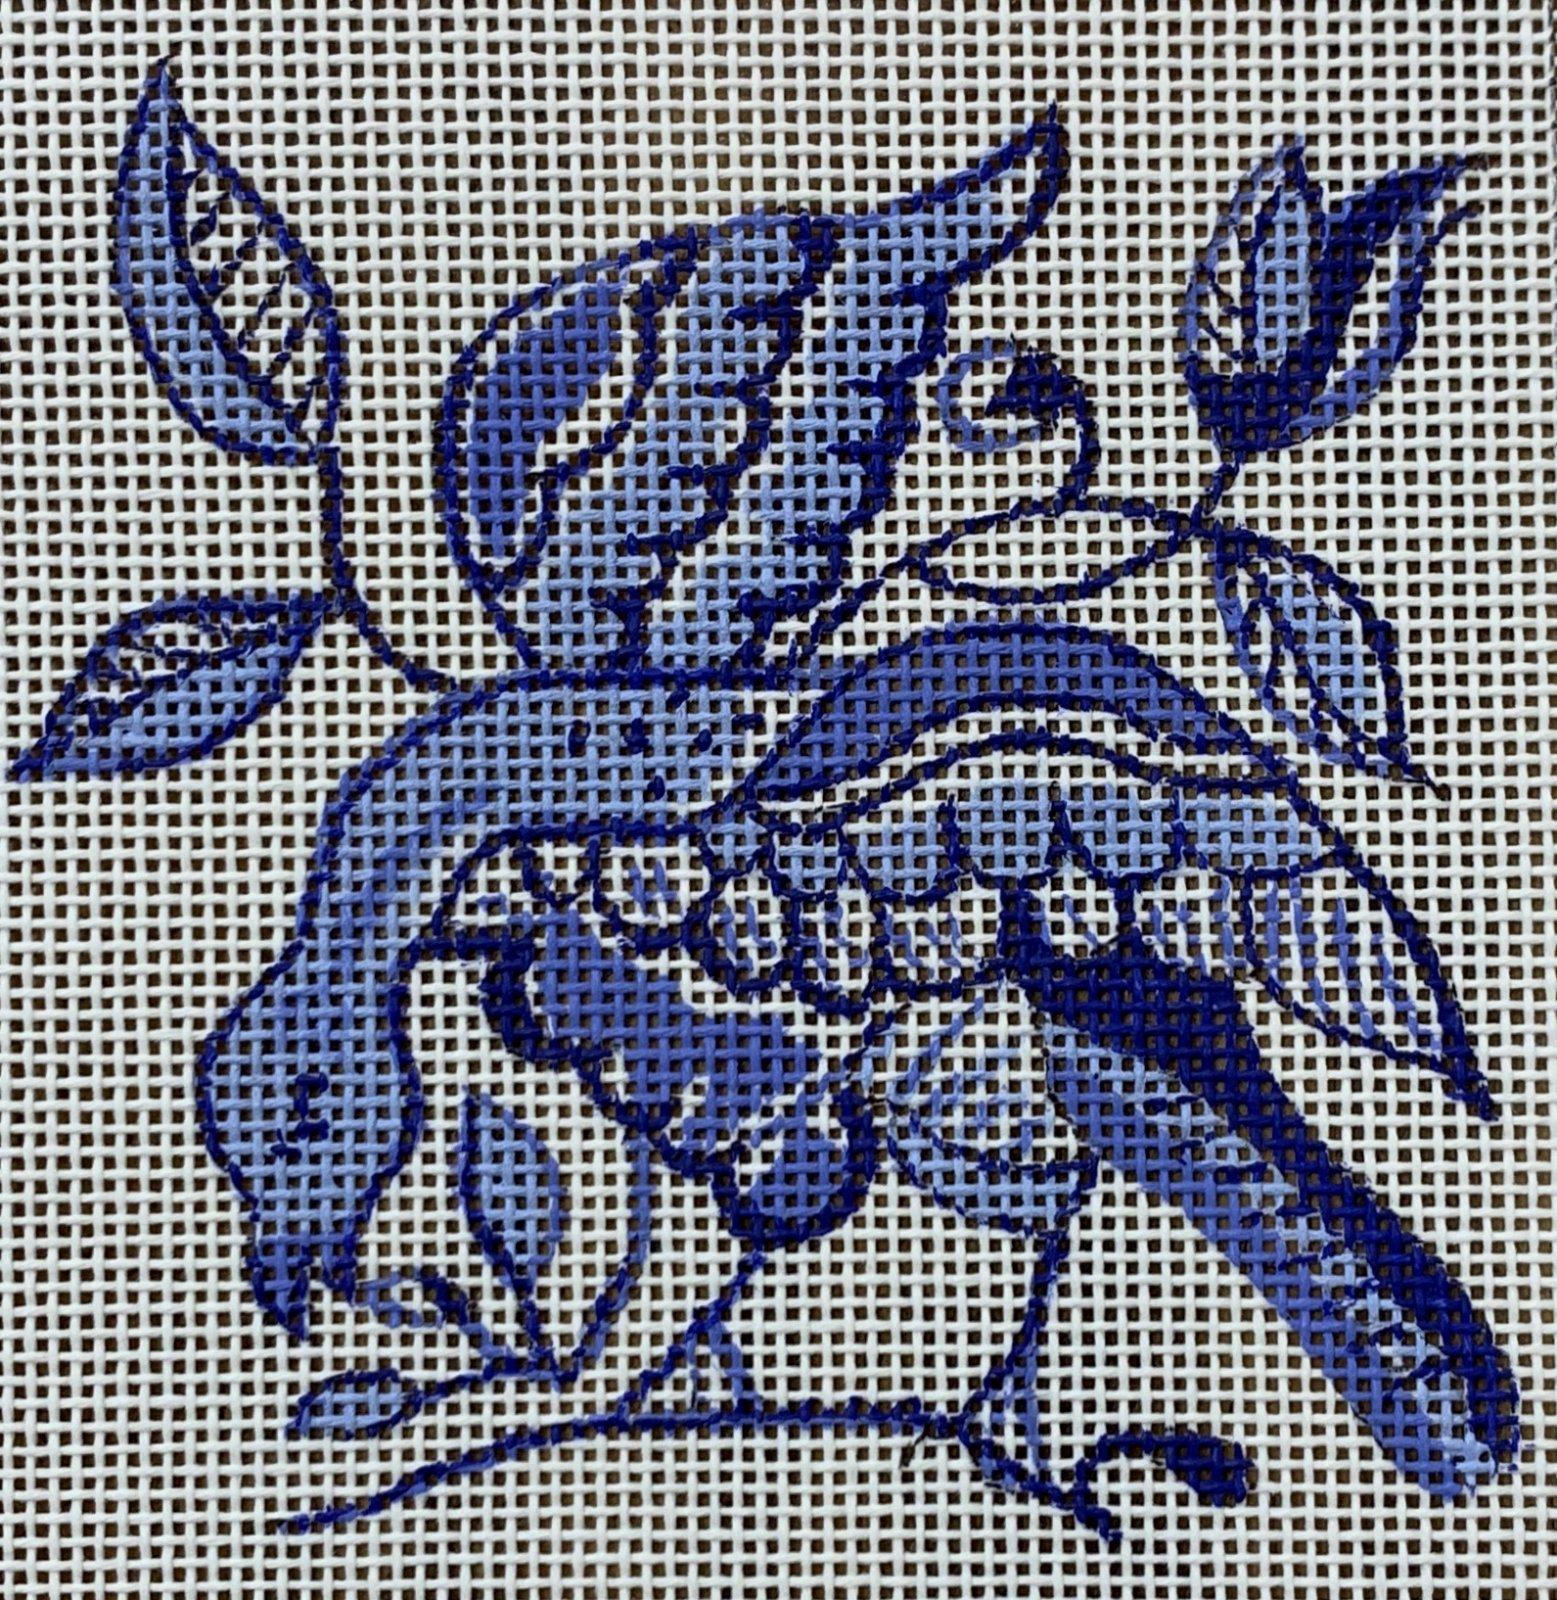 Delft Tiles Collection - Pheasant